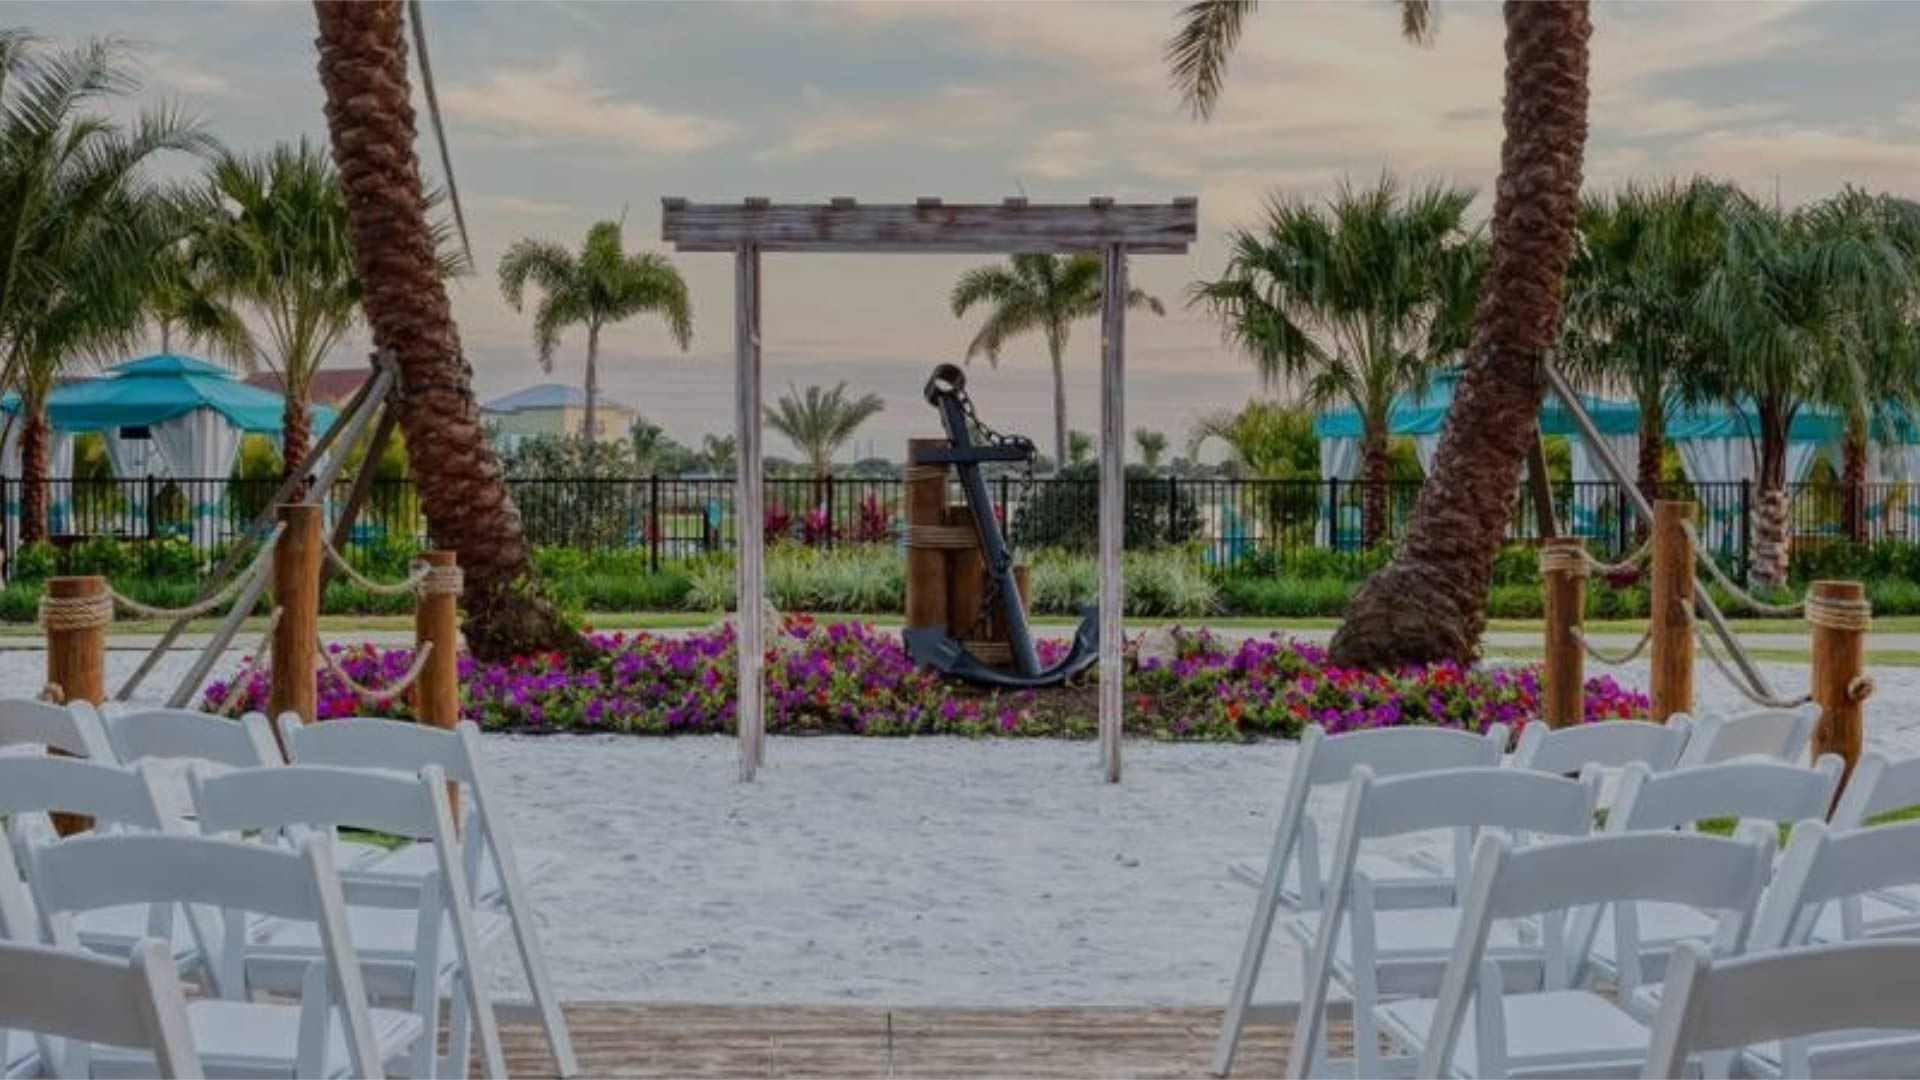 Margaritaville Resort Orlando 1 - Sensational Ceremonies